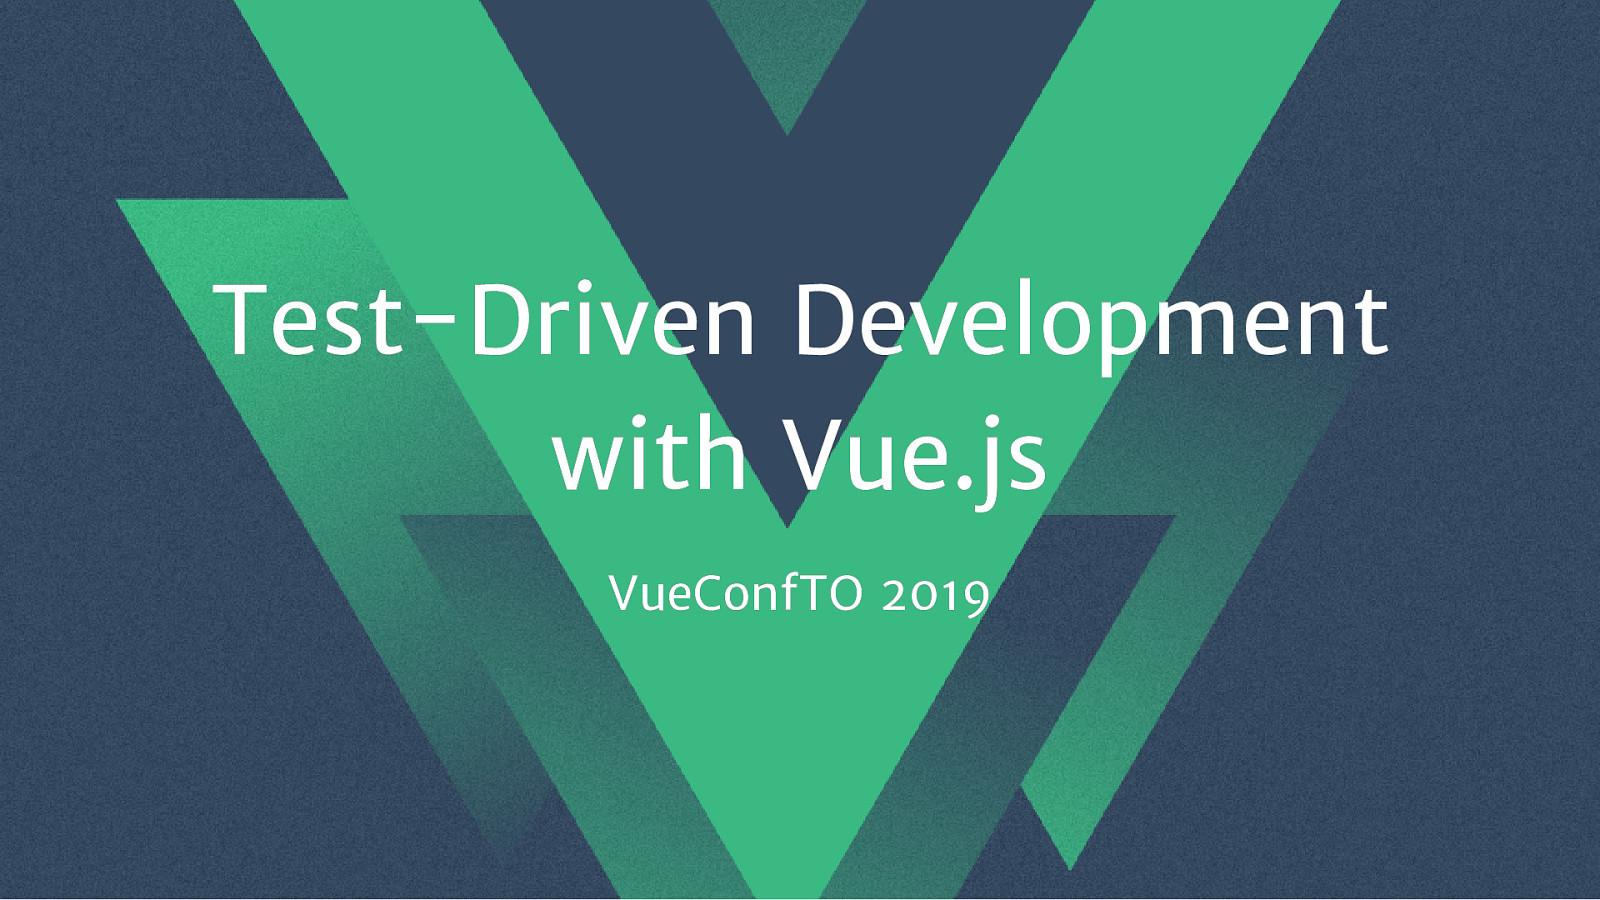 Test-Driven Development with Vue.js